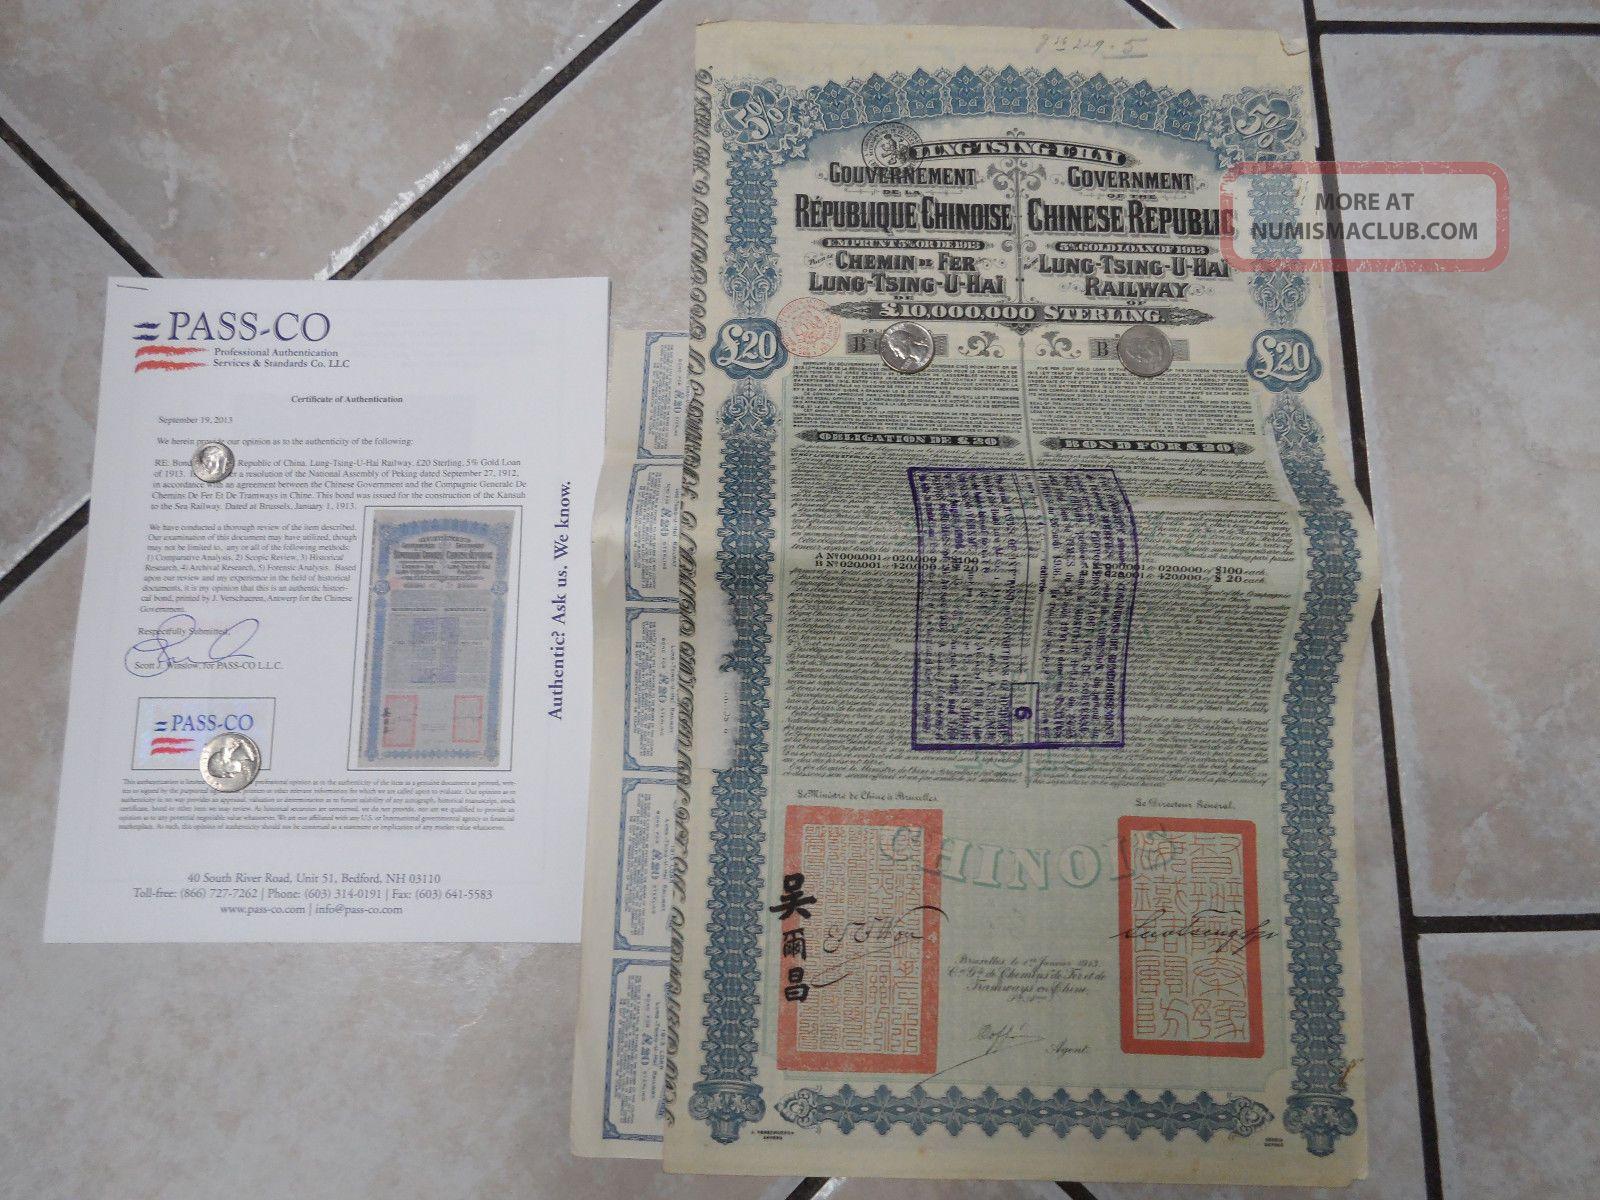 1913 Chinese Petchili Bond Uncanceled W/ Coupons China With Pass - Co Stocks & Bonds, Scripophily photo